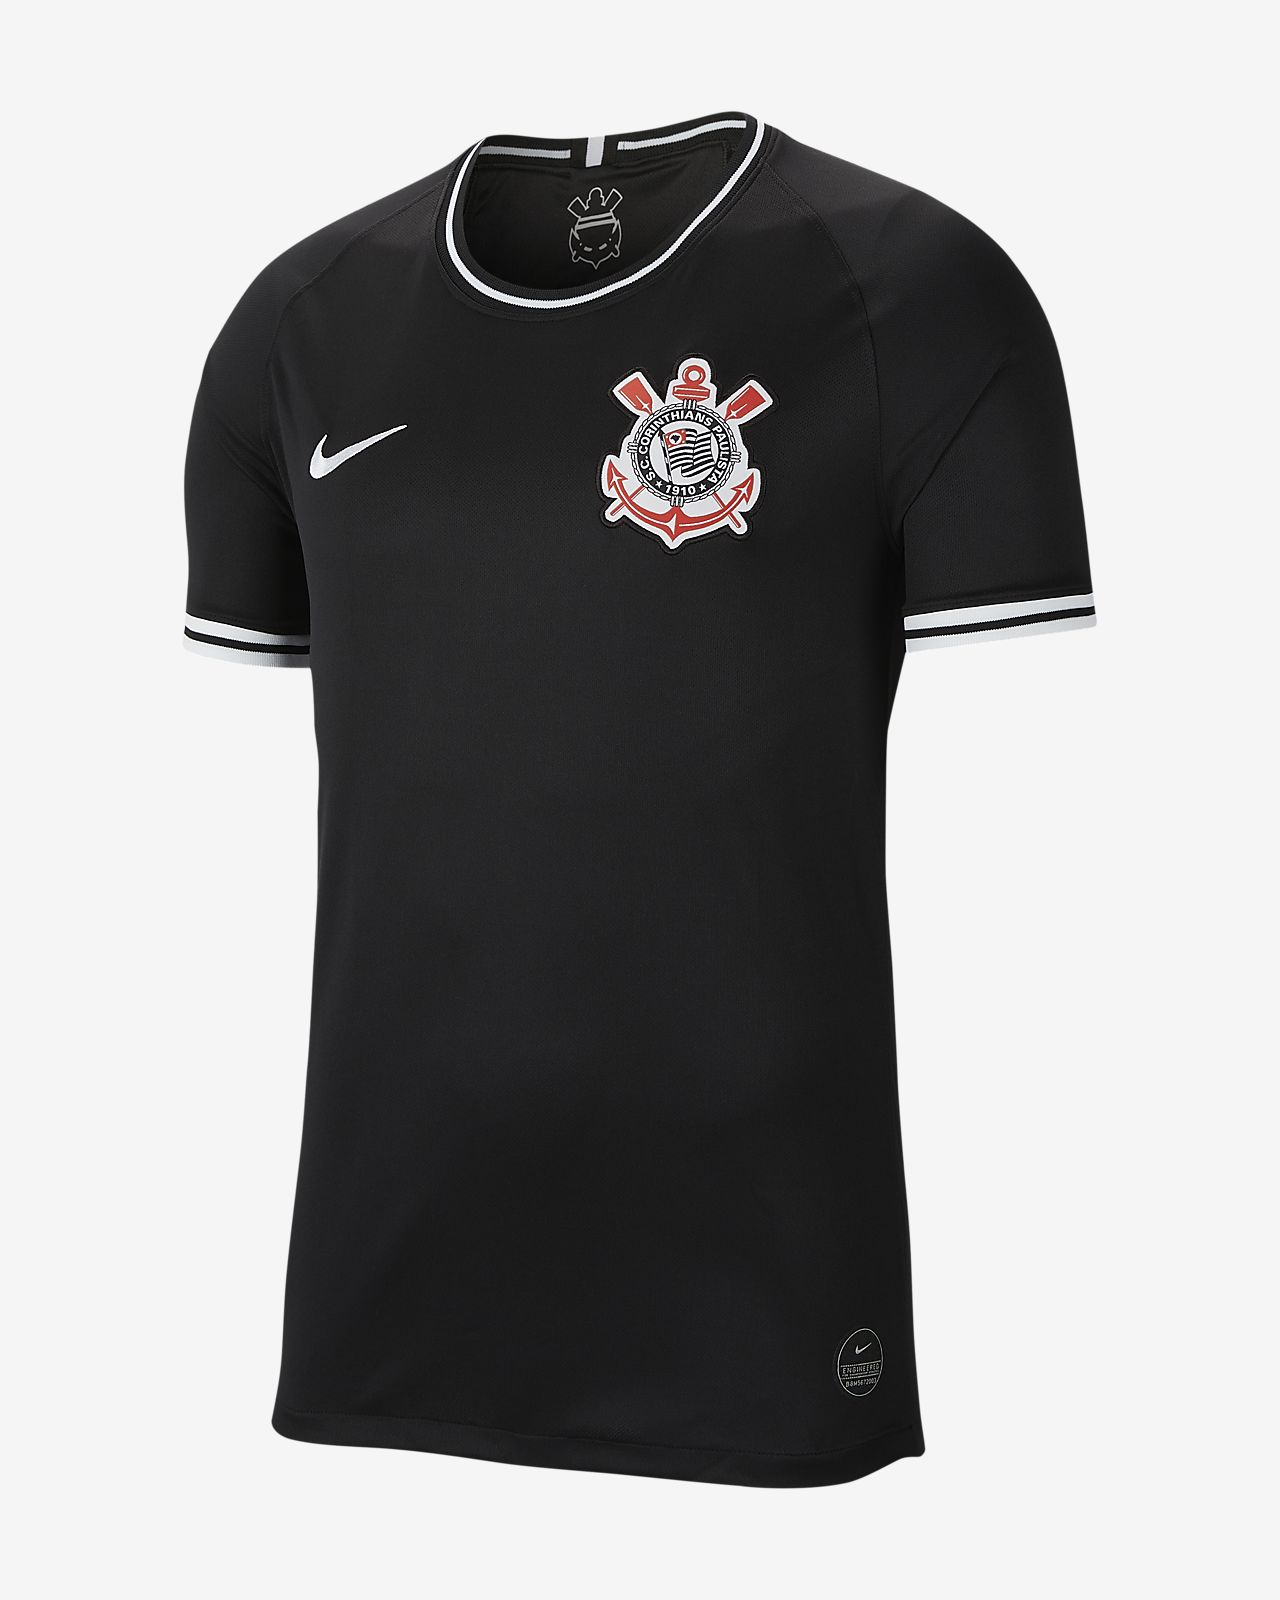 S.C. Corinthians 2019/20 Stadium Away - Uomo